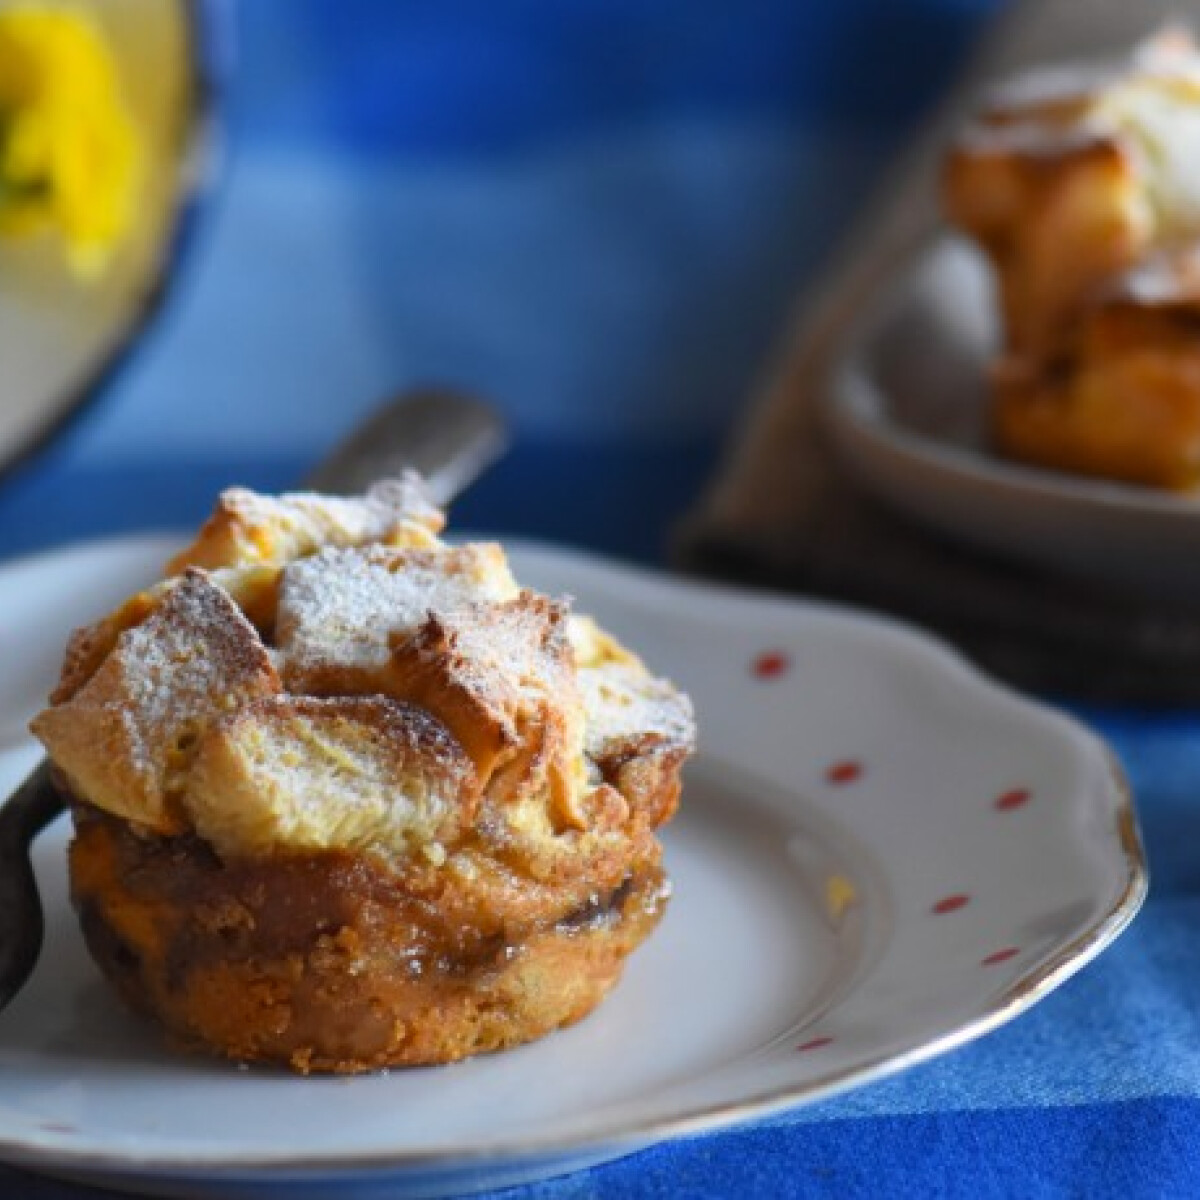 Kalácsfelfújt muffinformában